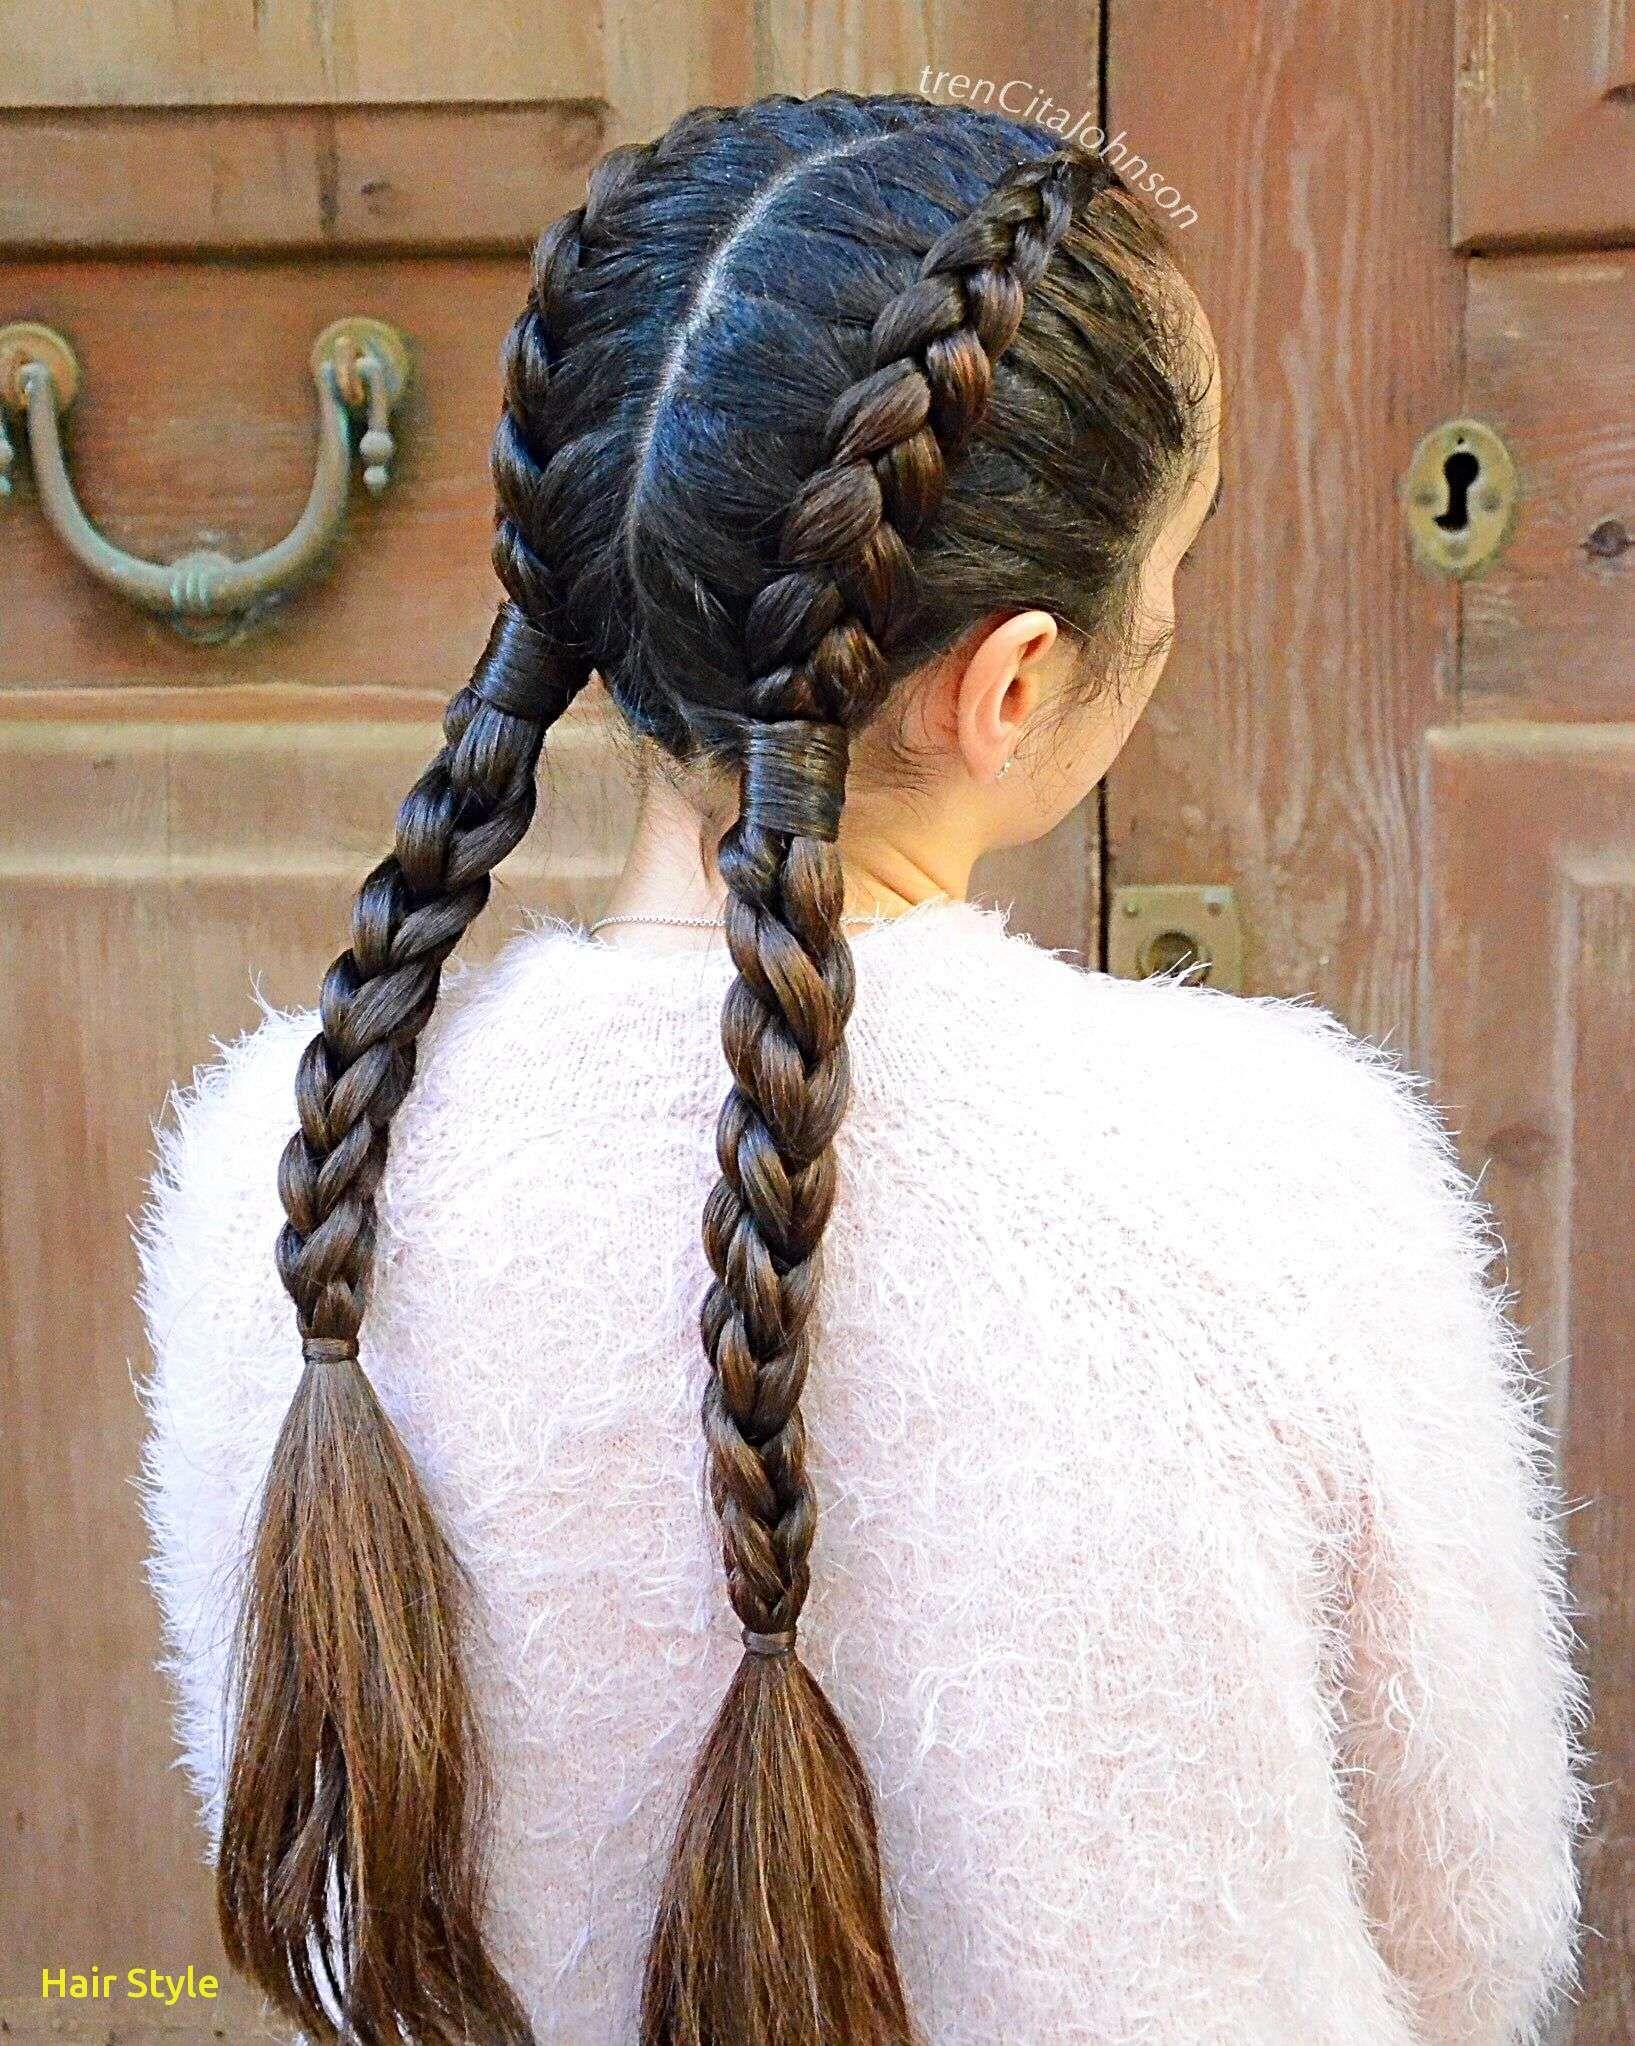 Neufrisurenstile Com Braided Hairstyles Little Girl Hairstyles Hair Styles